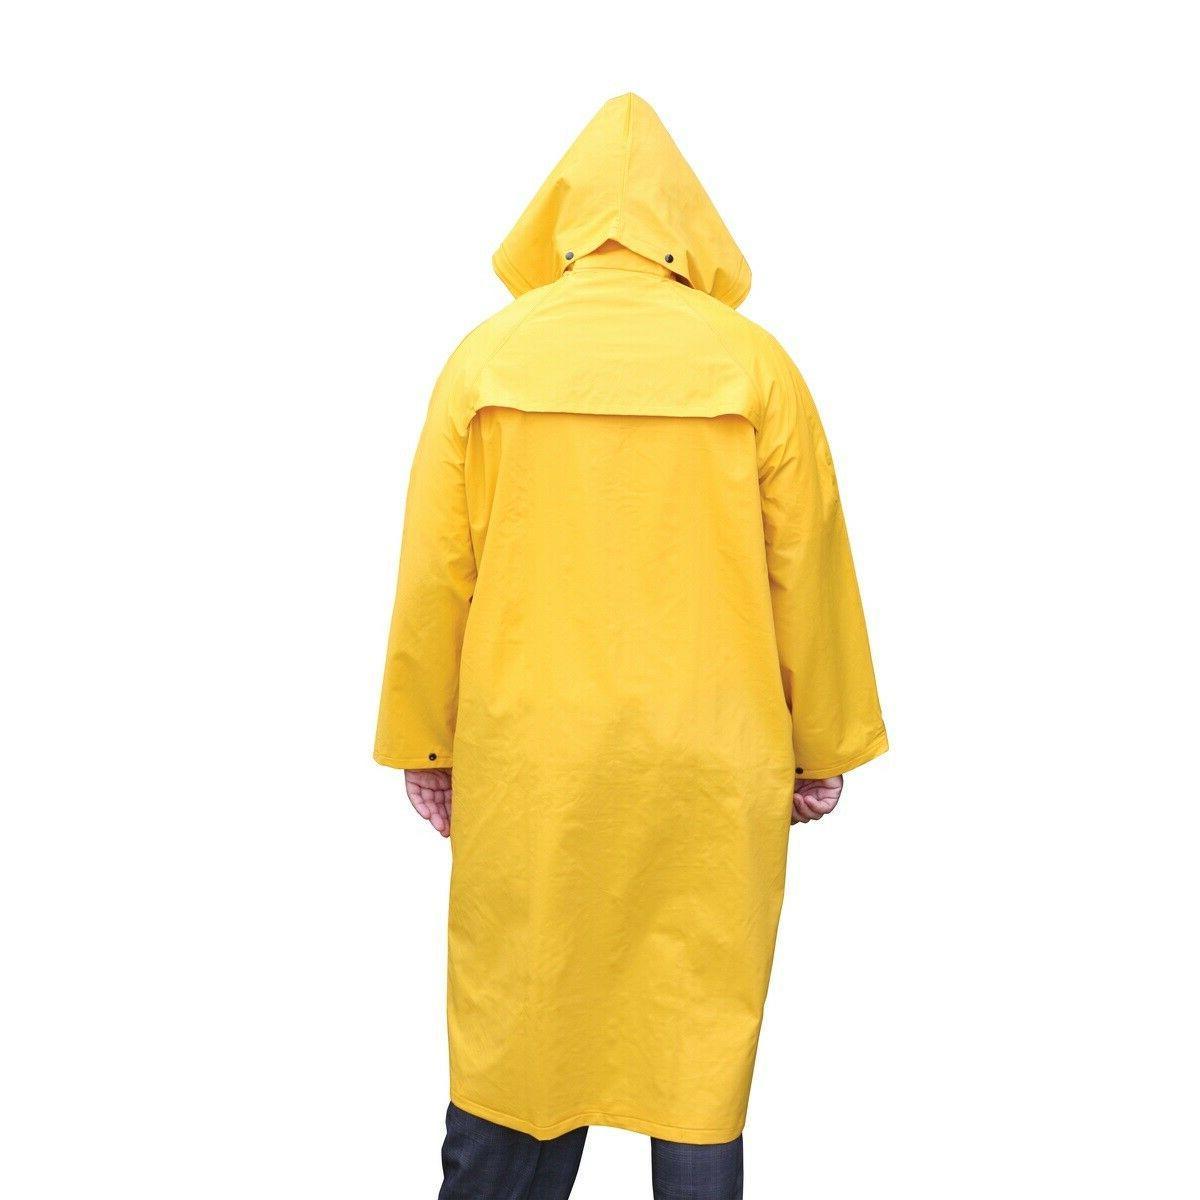 "Safety Coat Yellow Rain Jacket 49"" Detachable Hood .35mm / Polyester"